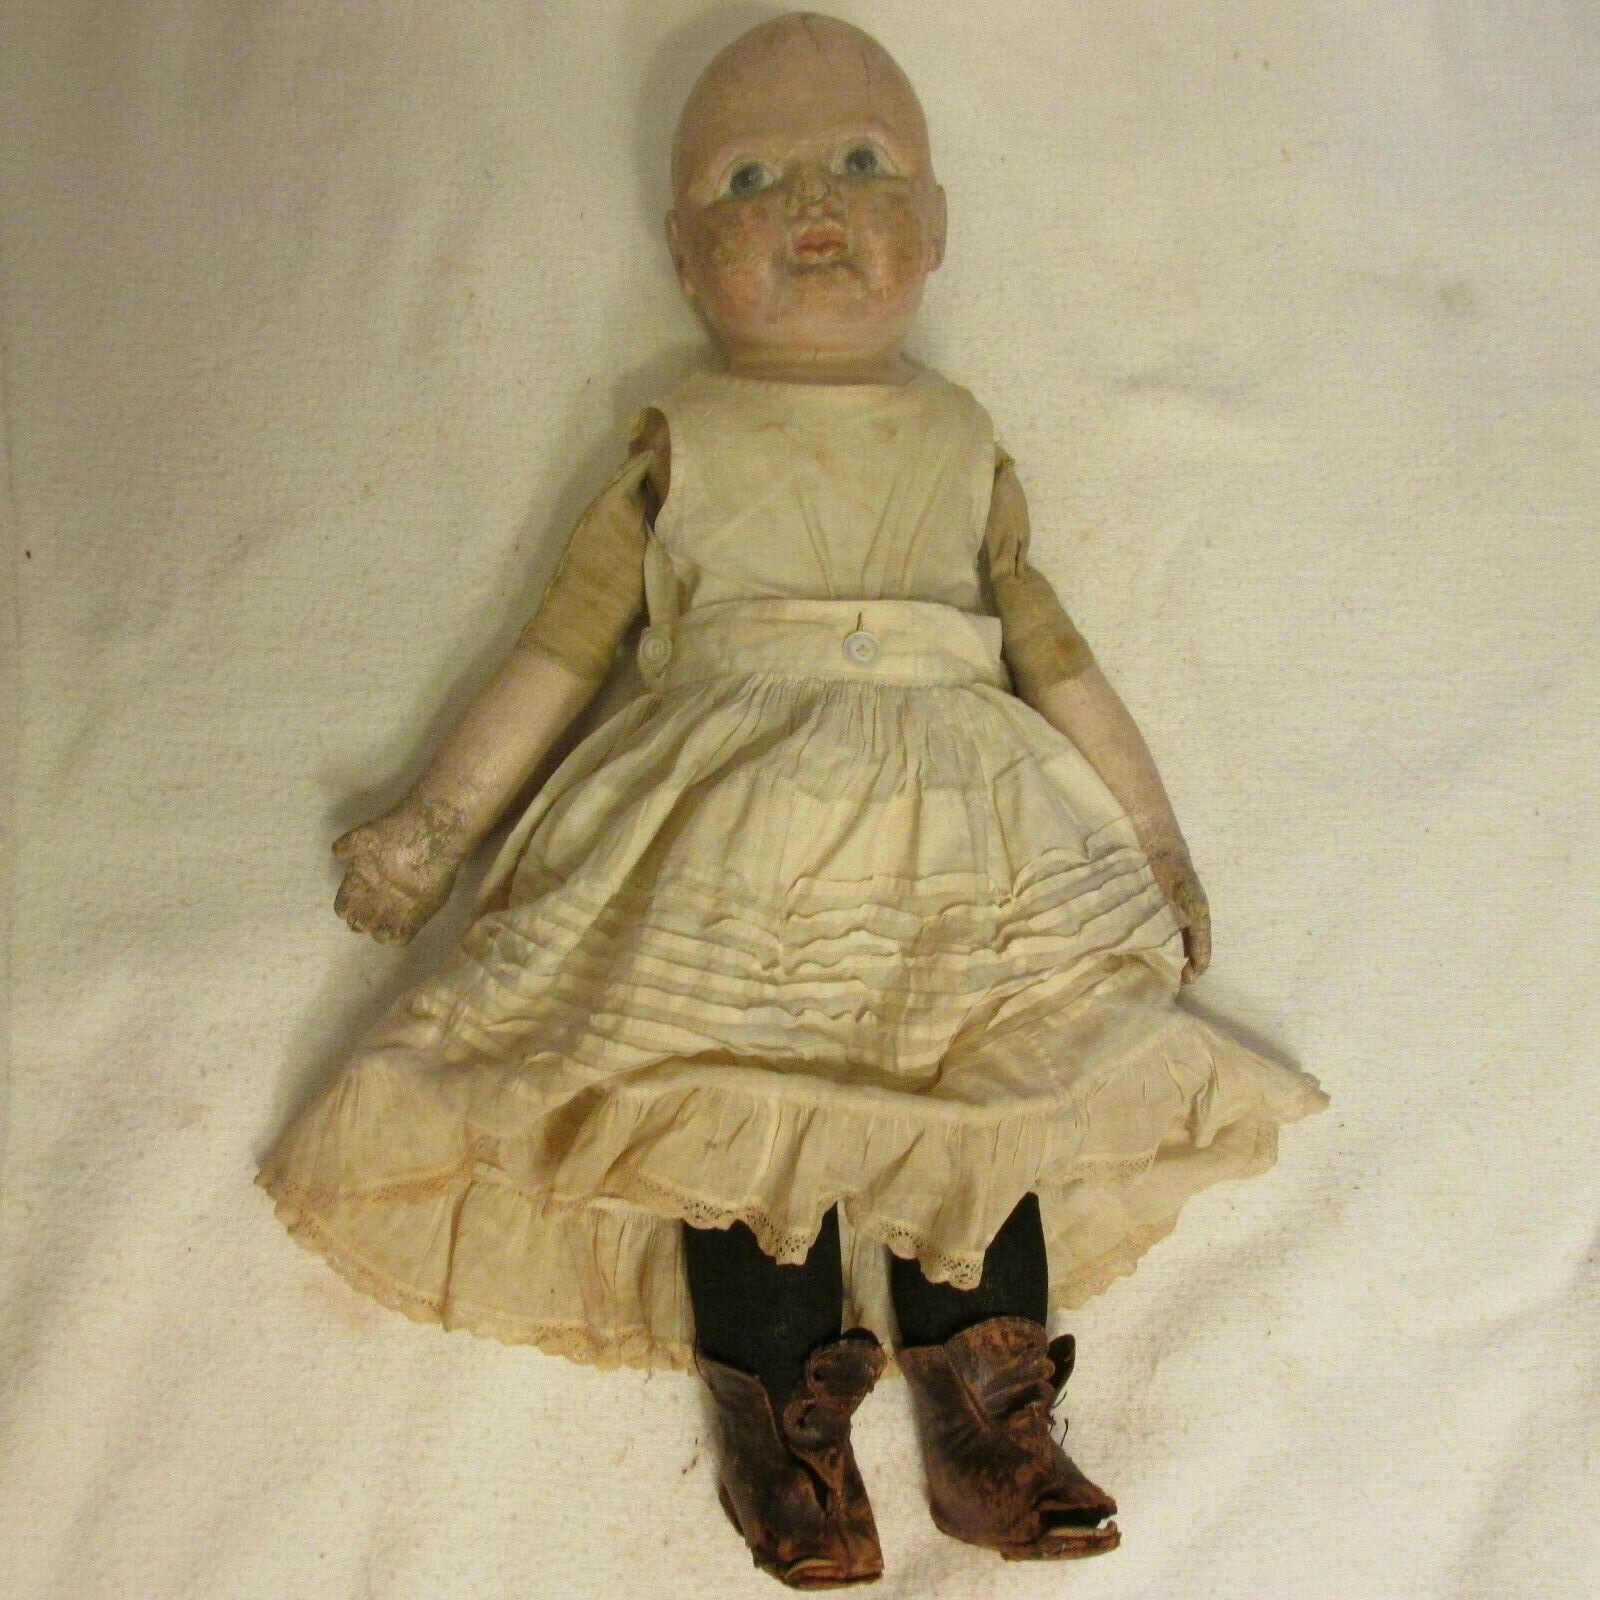 Antique Doll Philadelphia Baby JB Sheppard Co Rag Stockinette Clothes Shoes - $899.99